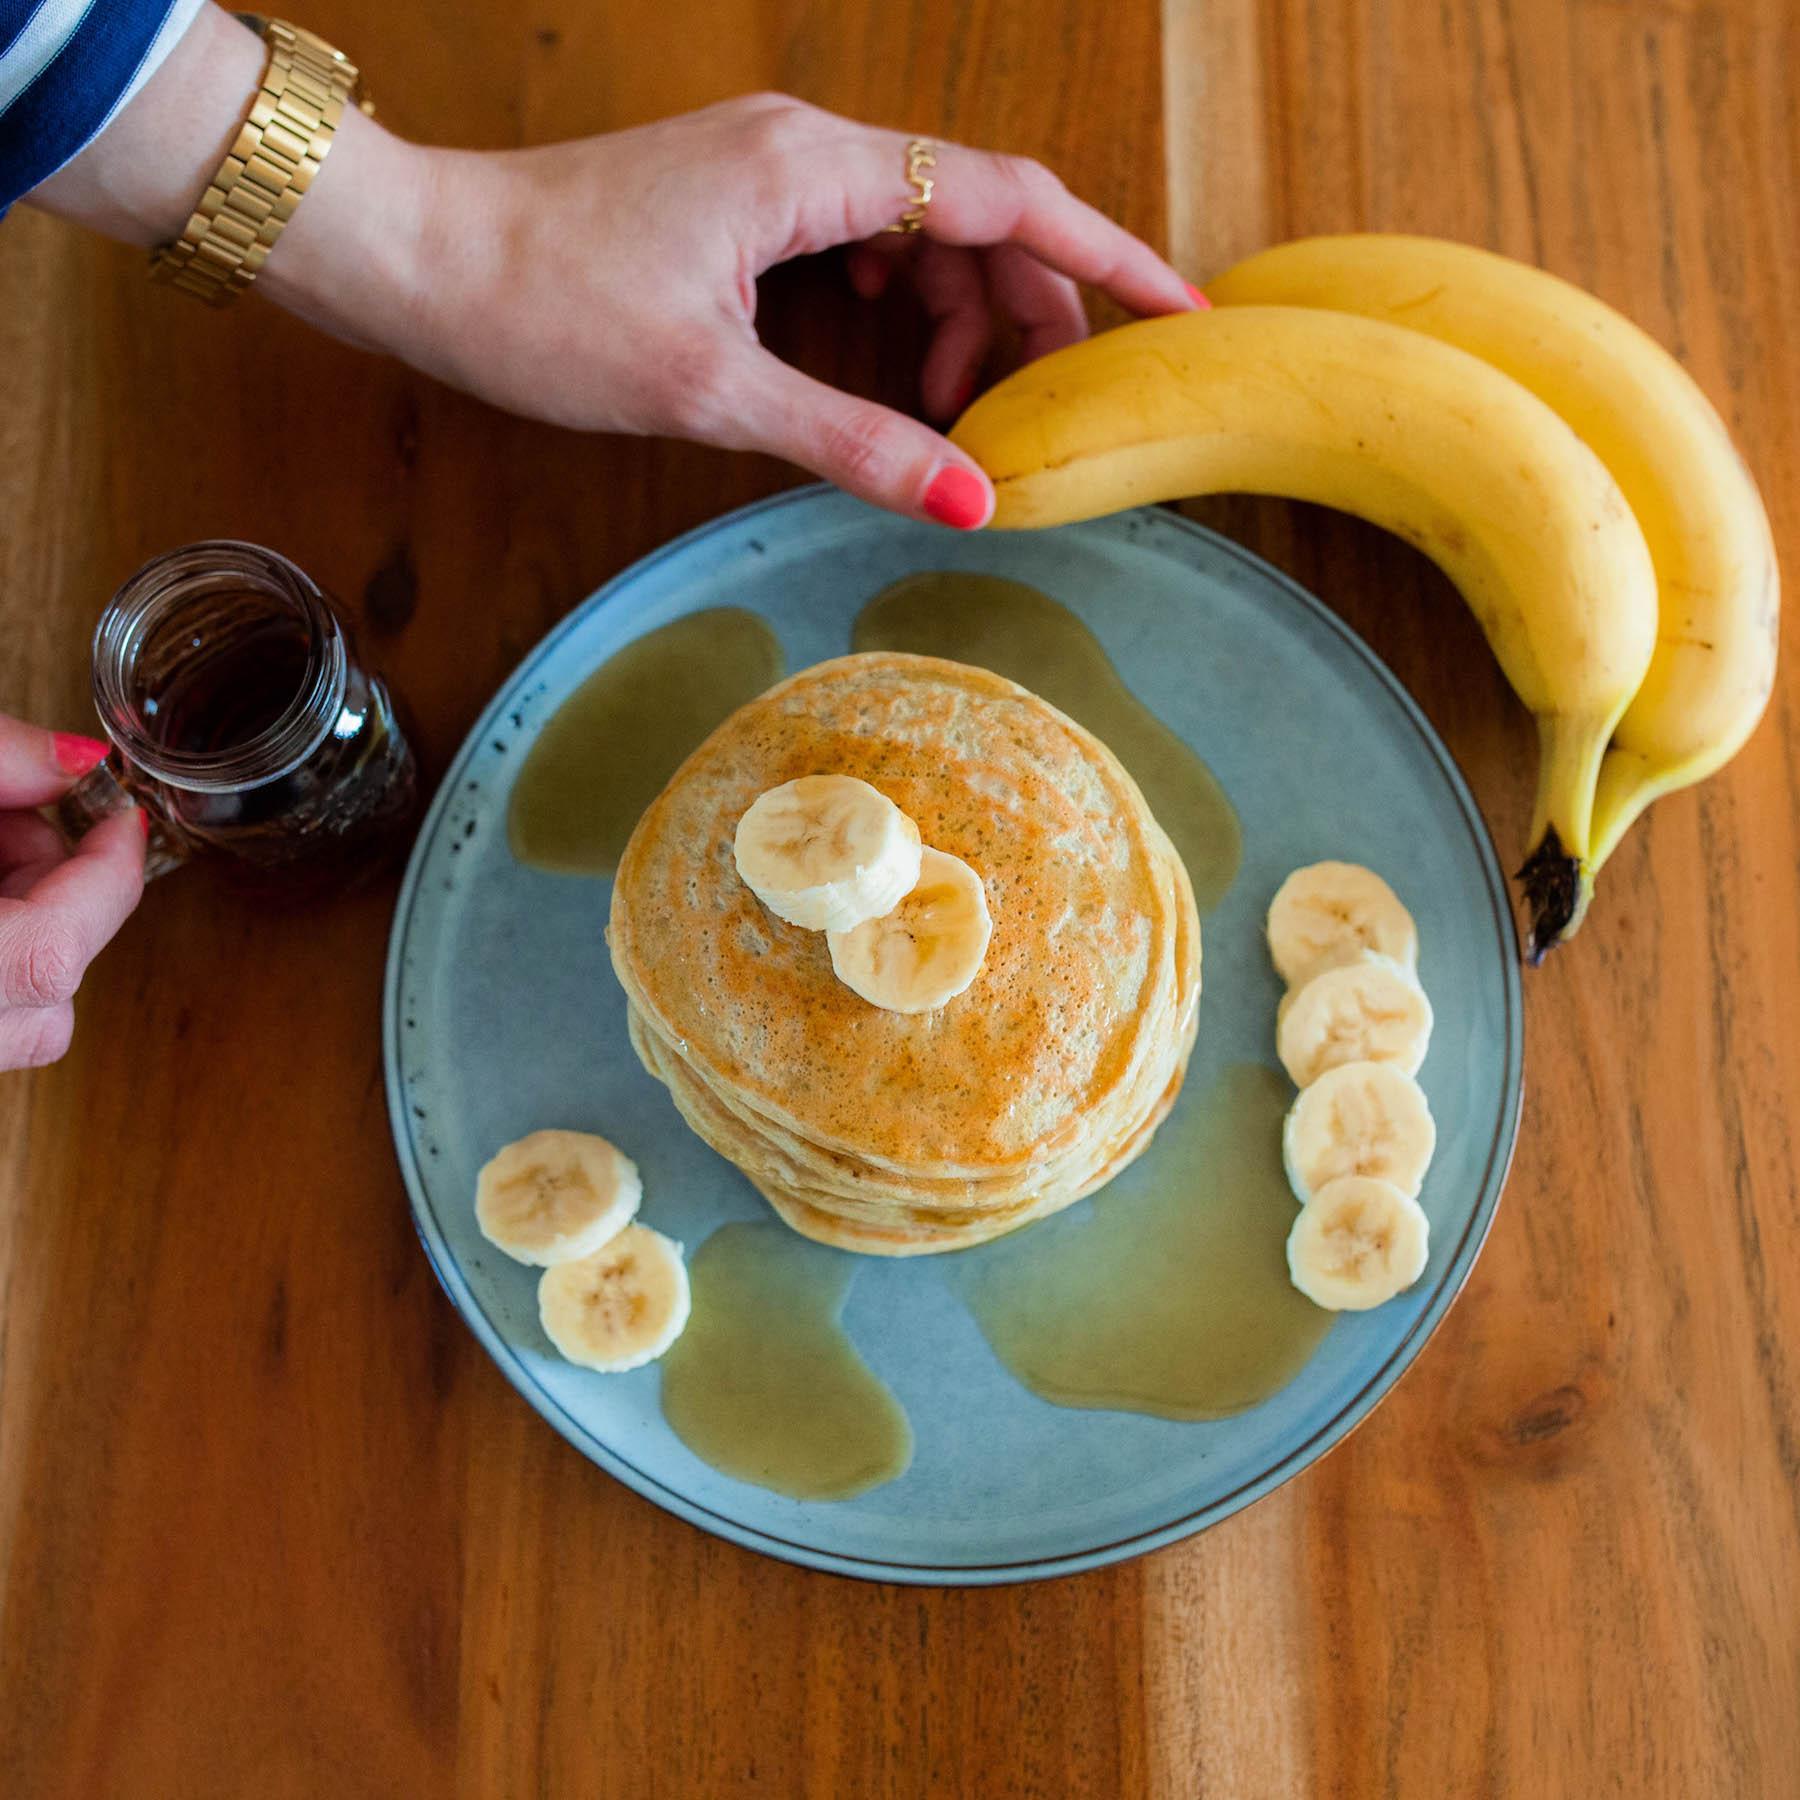 suelovesnyc_schaer_banana_pancakes_glutenfreie_bananen_pancakes_rezept_glutenfrei_5-Kopie_3